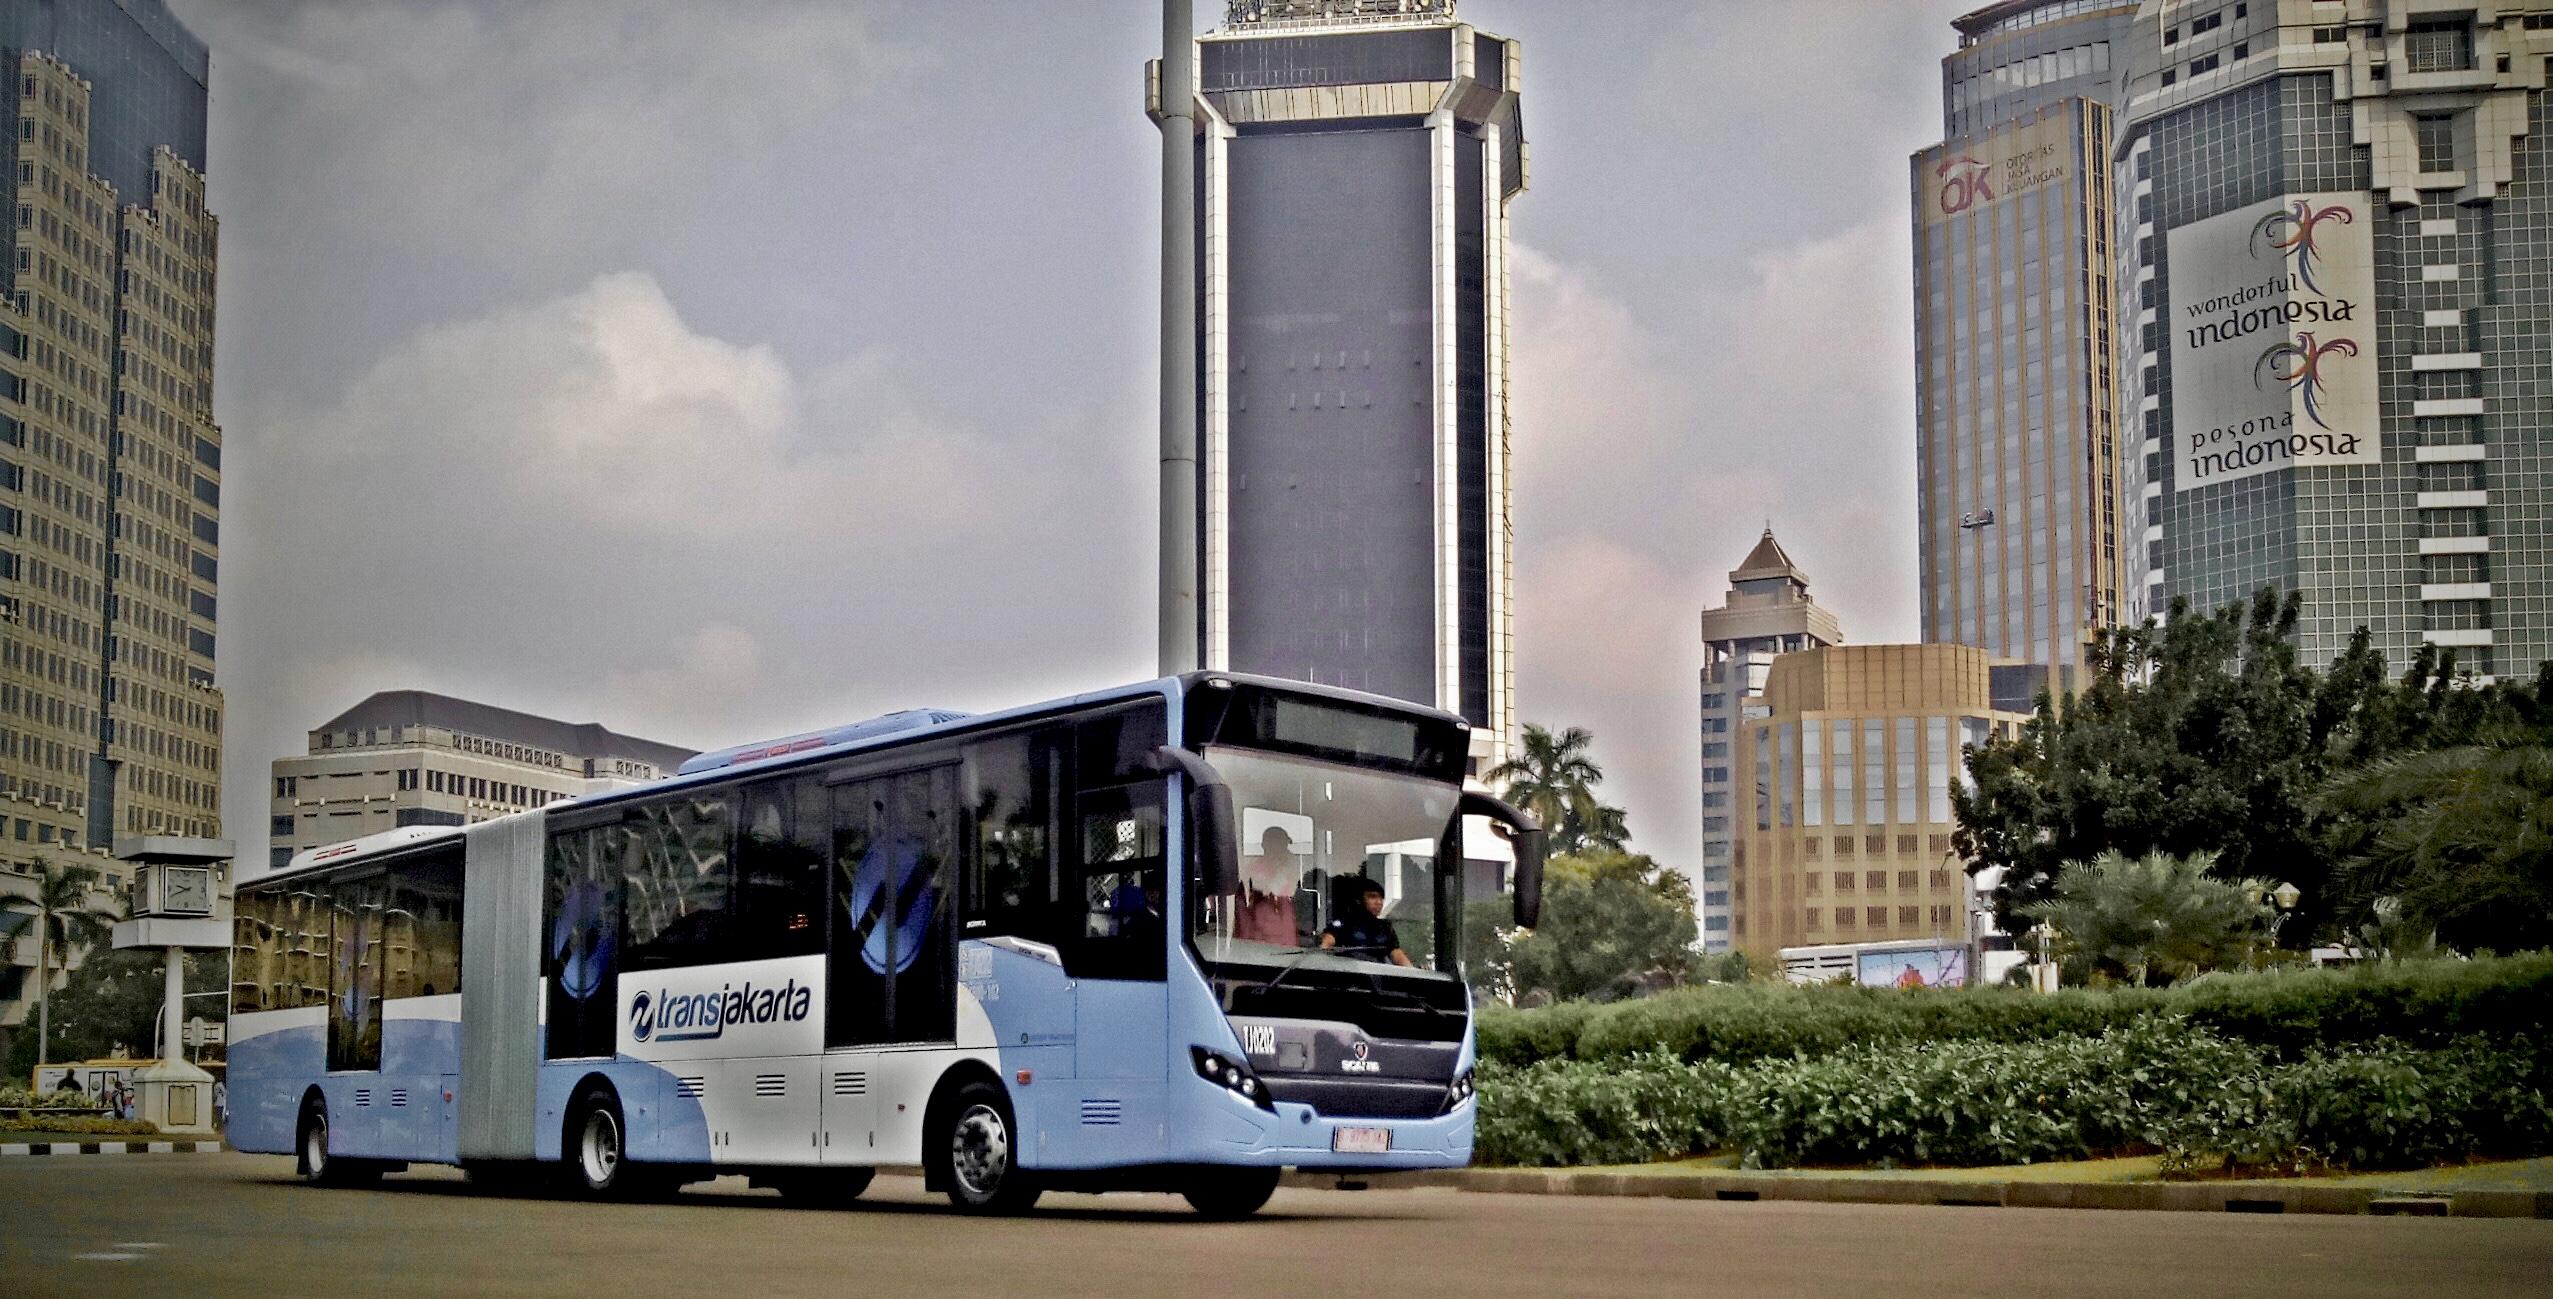 Koridor 5 Transjakarta Wikipedia Bahasa Indonesia Ensiklopedia Bebas